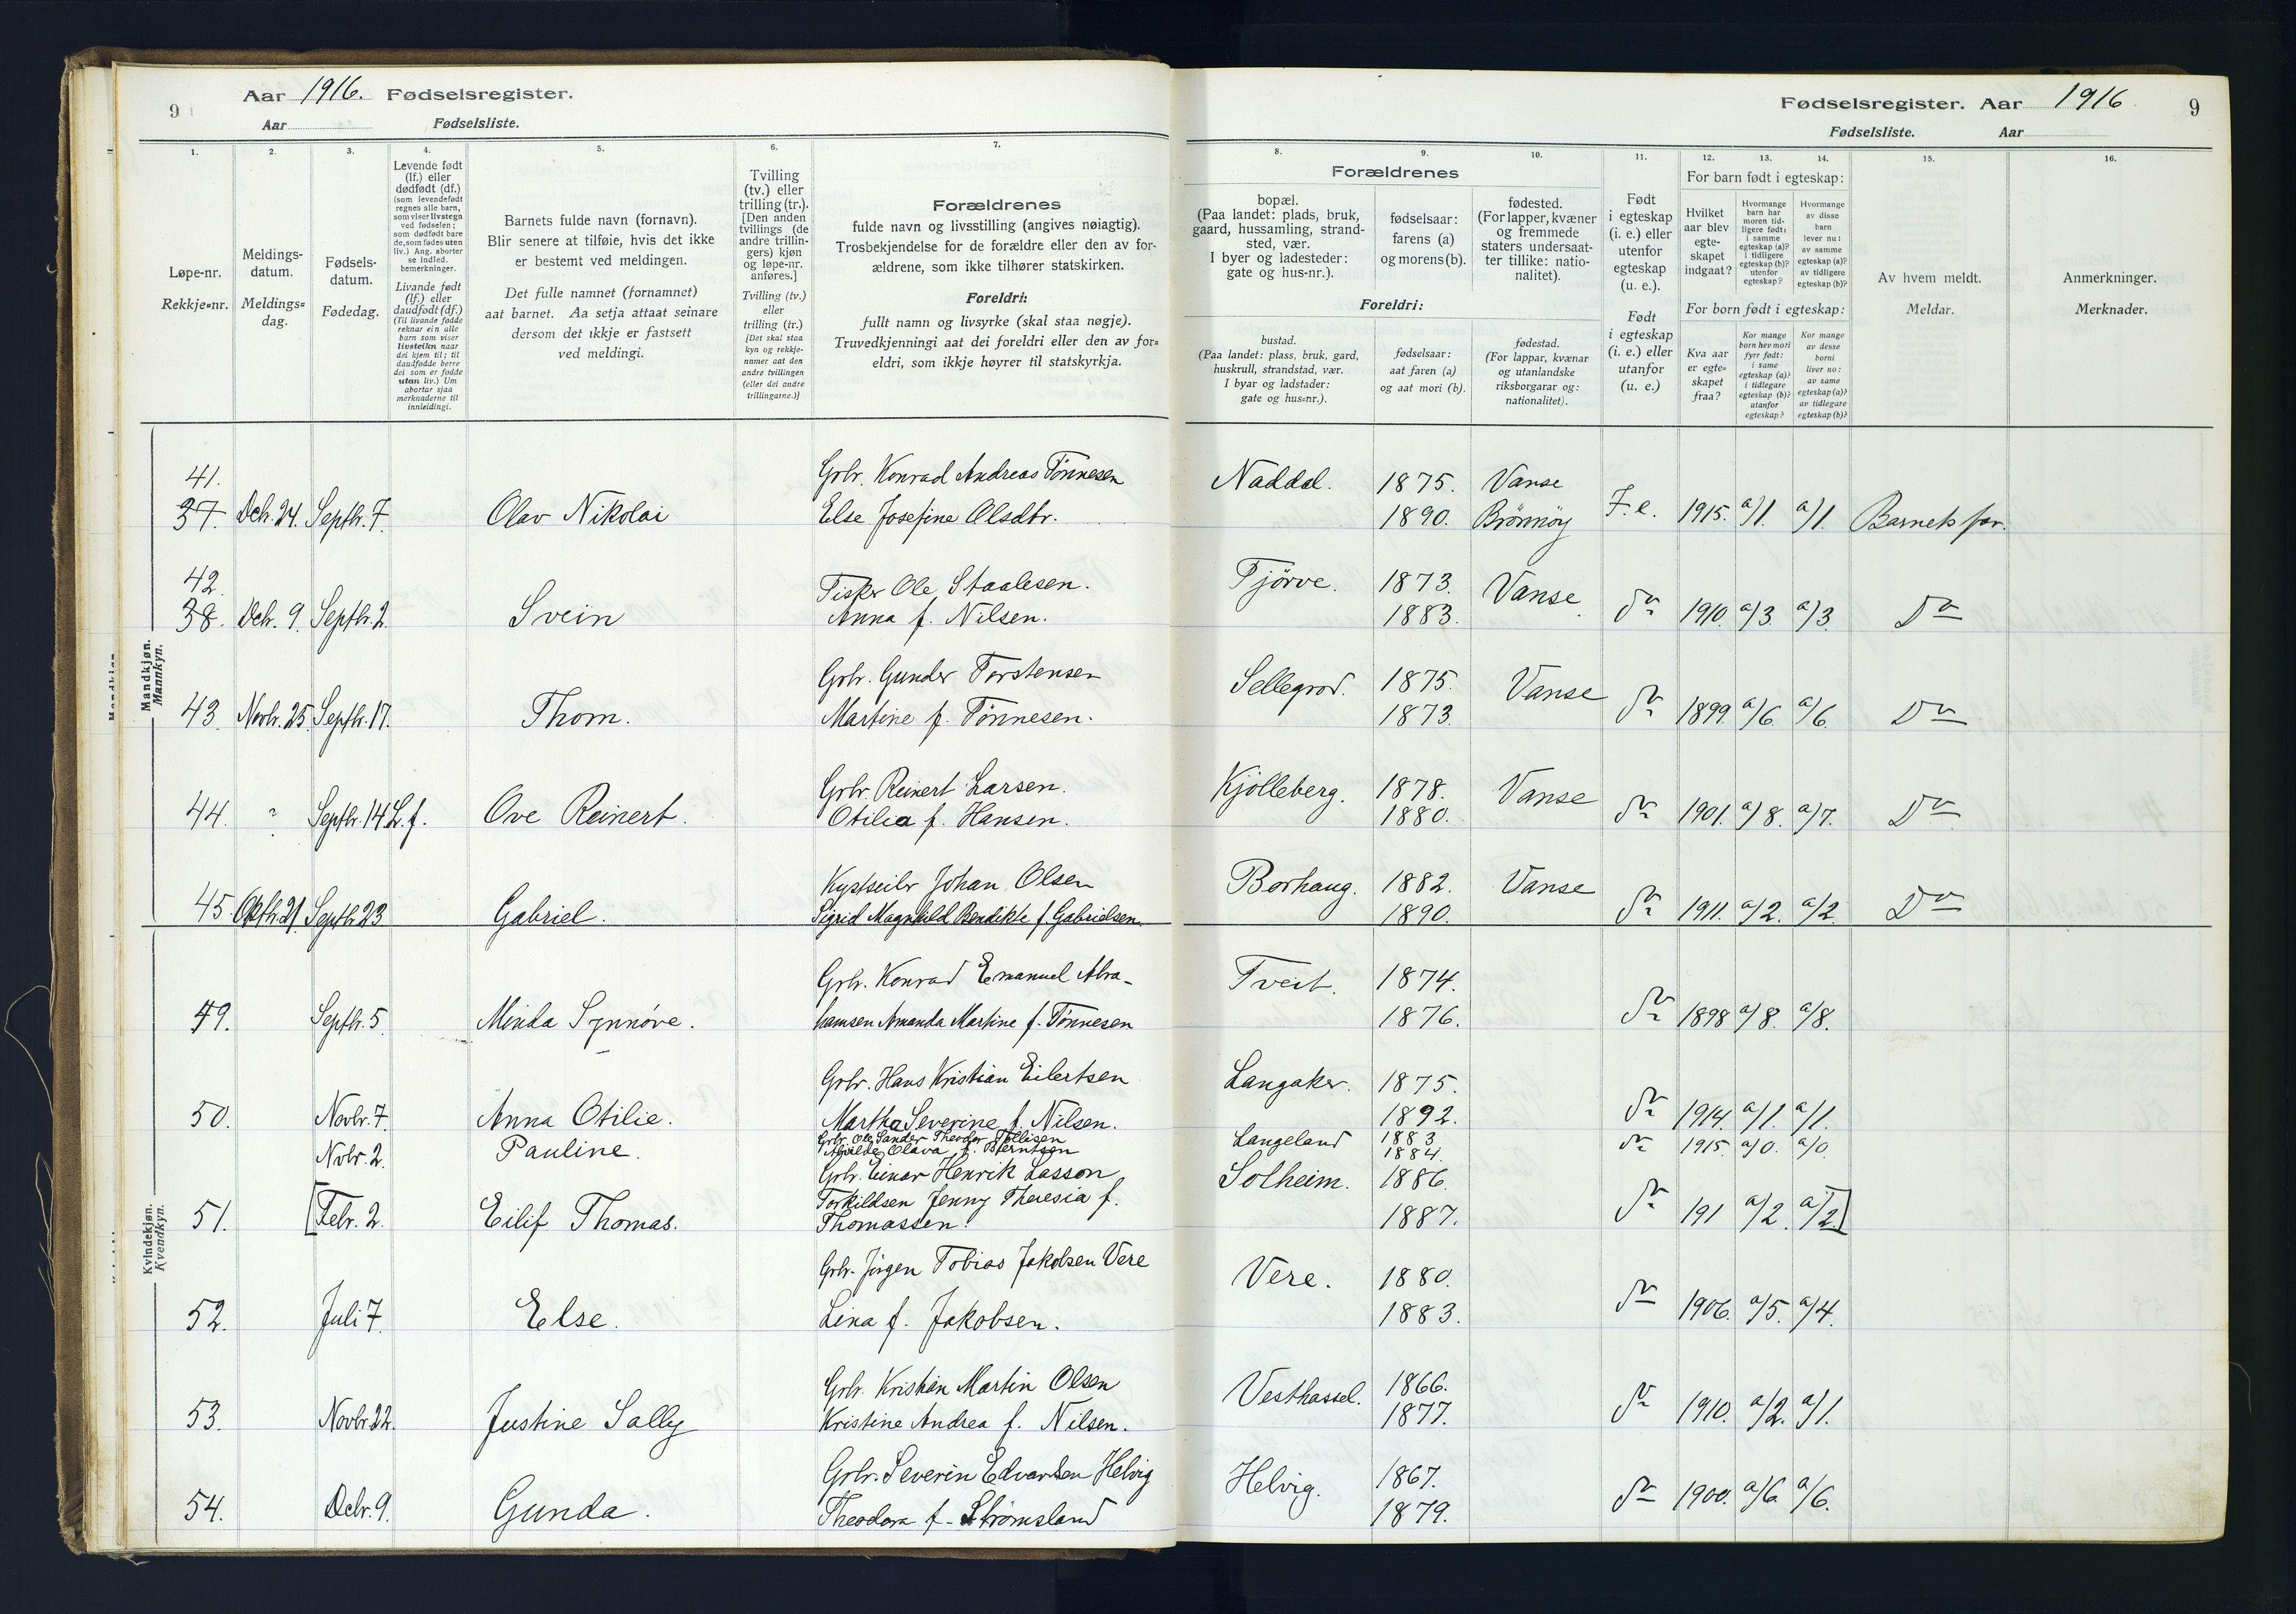 SAK, Lista sokneprestkontor, J/Ja/L0001: Fødselsregister nr. A-VI-30, 1916-1934, s. 9